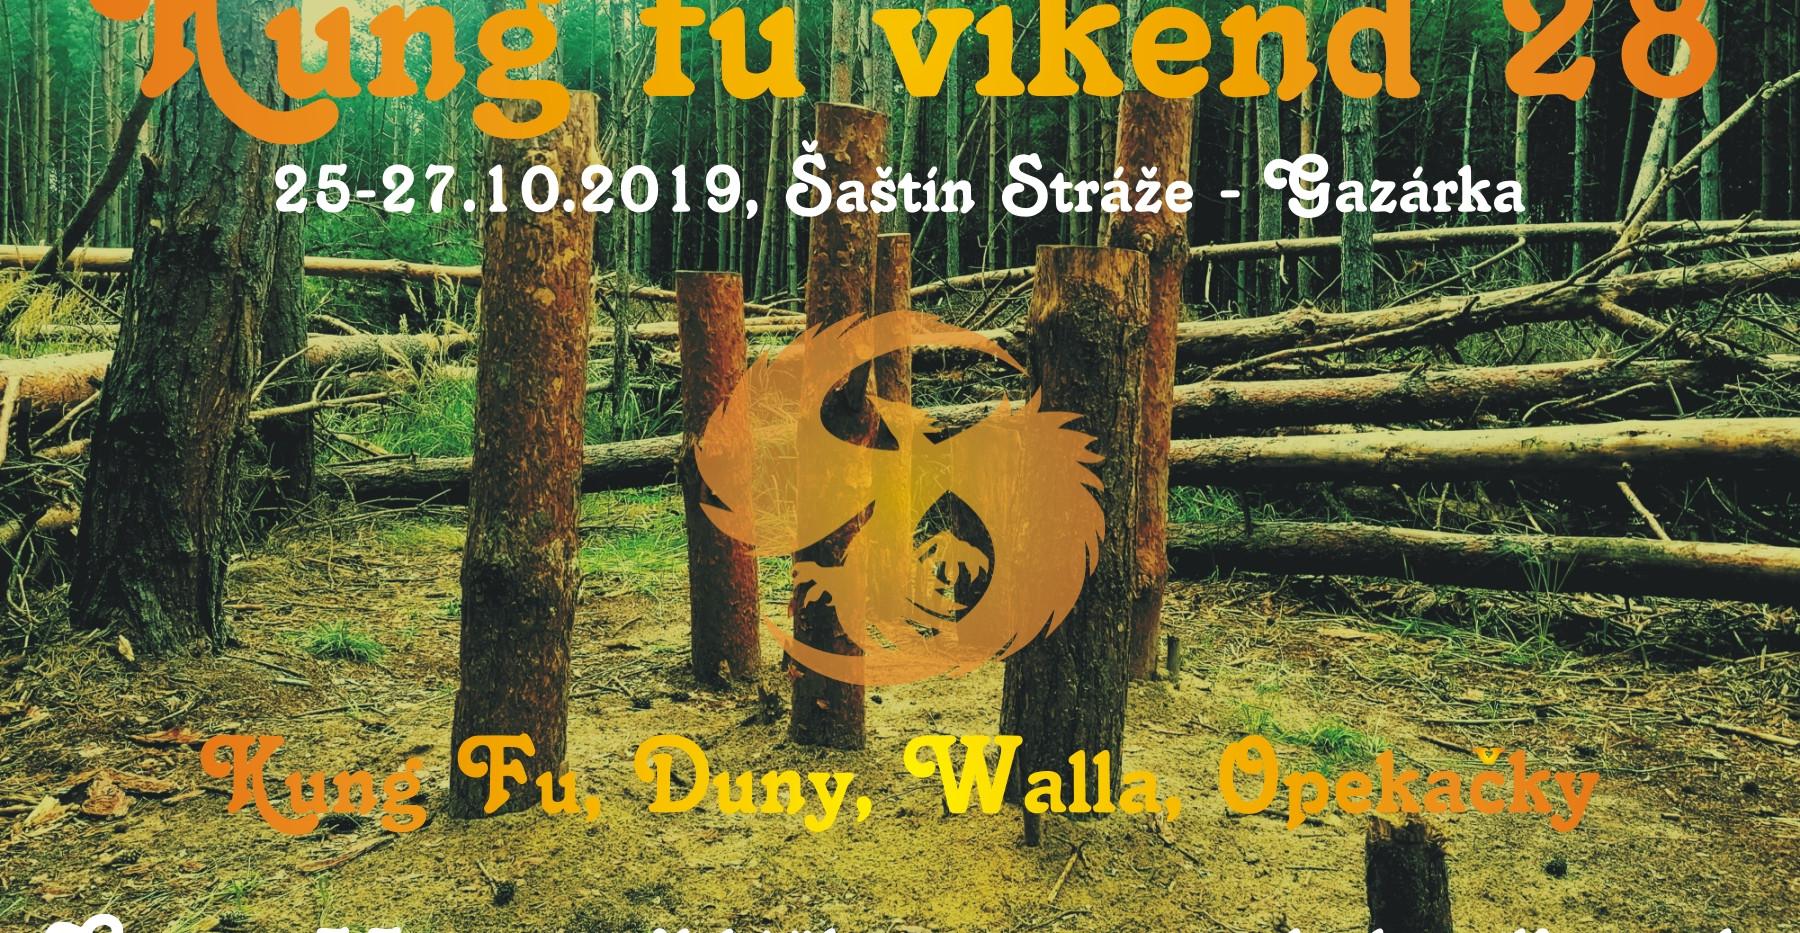 Kung fu víkend 28